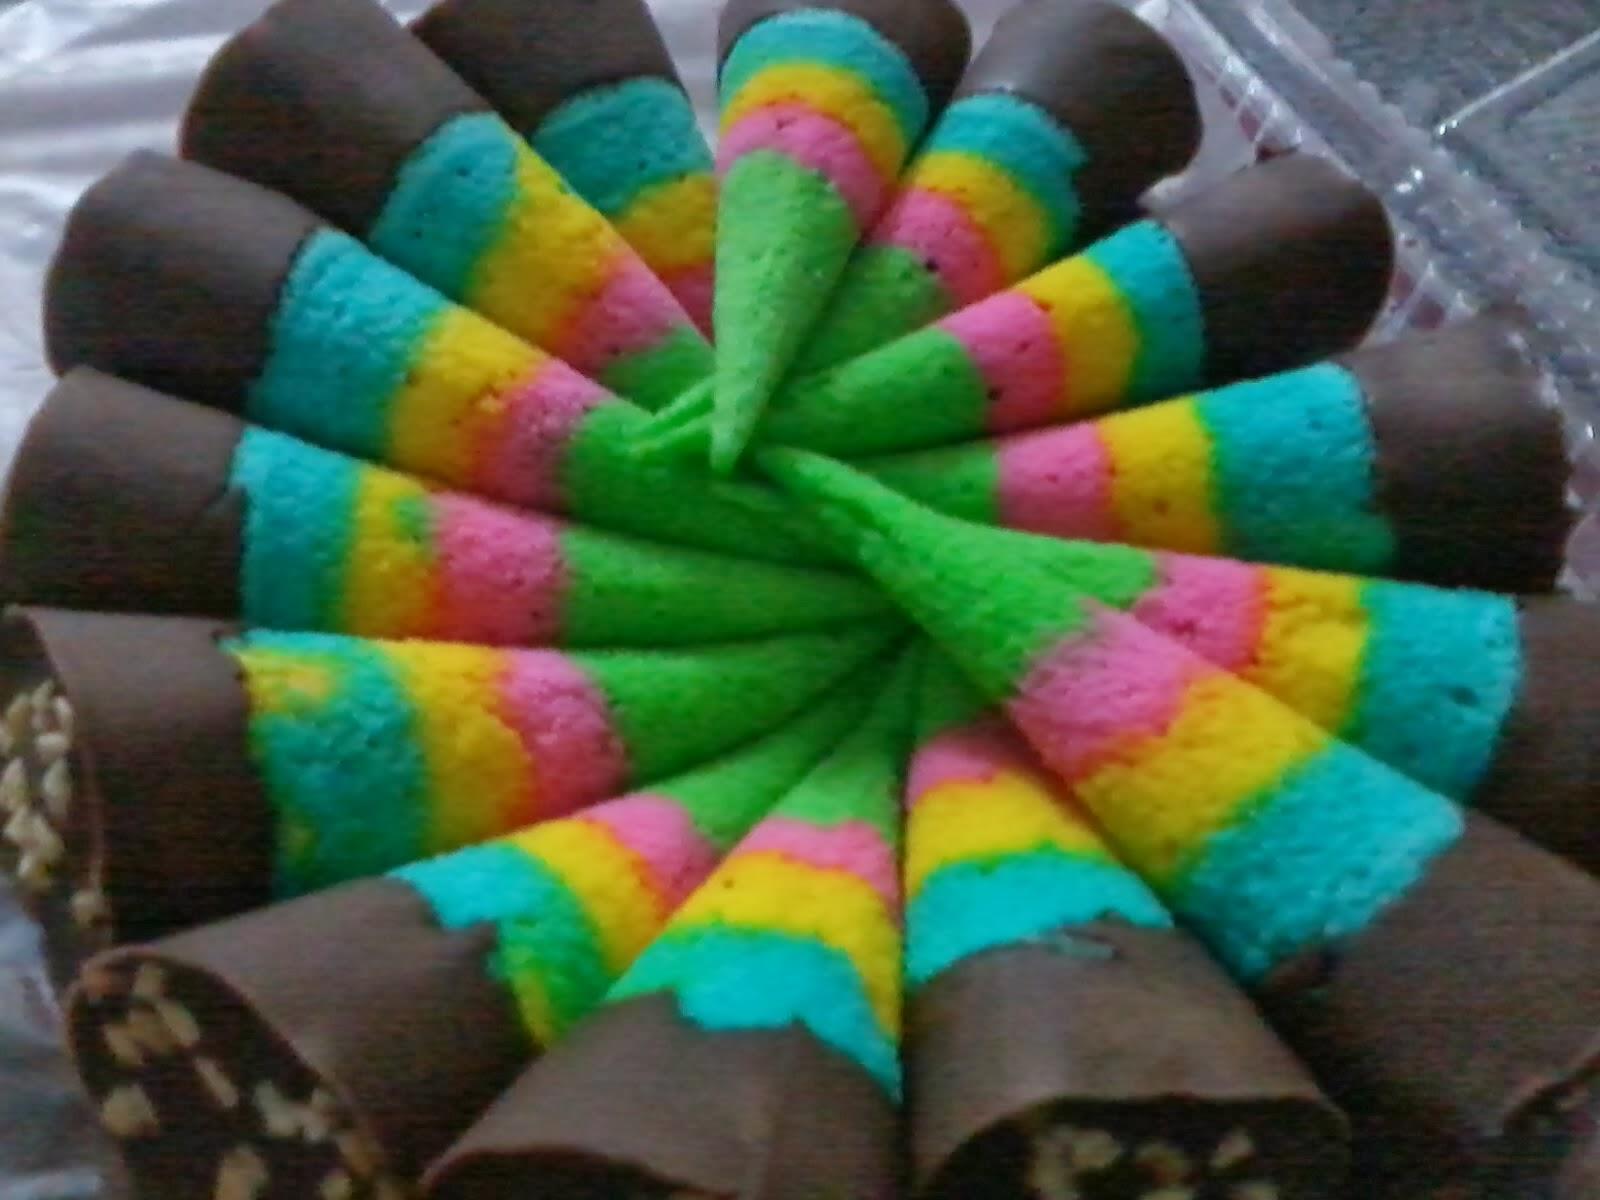 Apam Polkadot JampS Bakery Apam Mini Ais Kim Cornetto